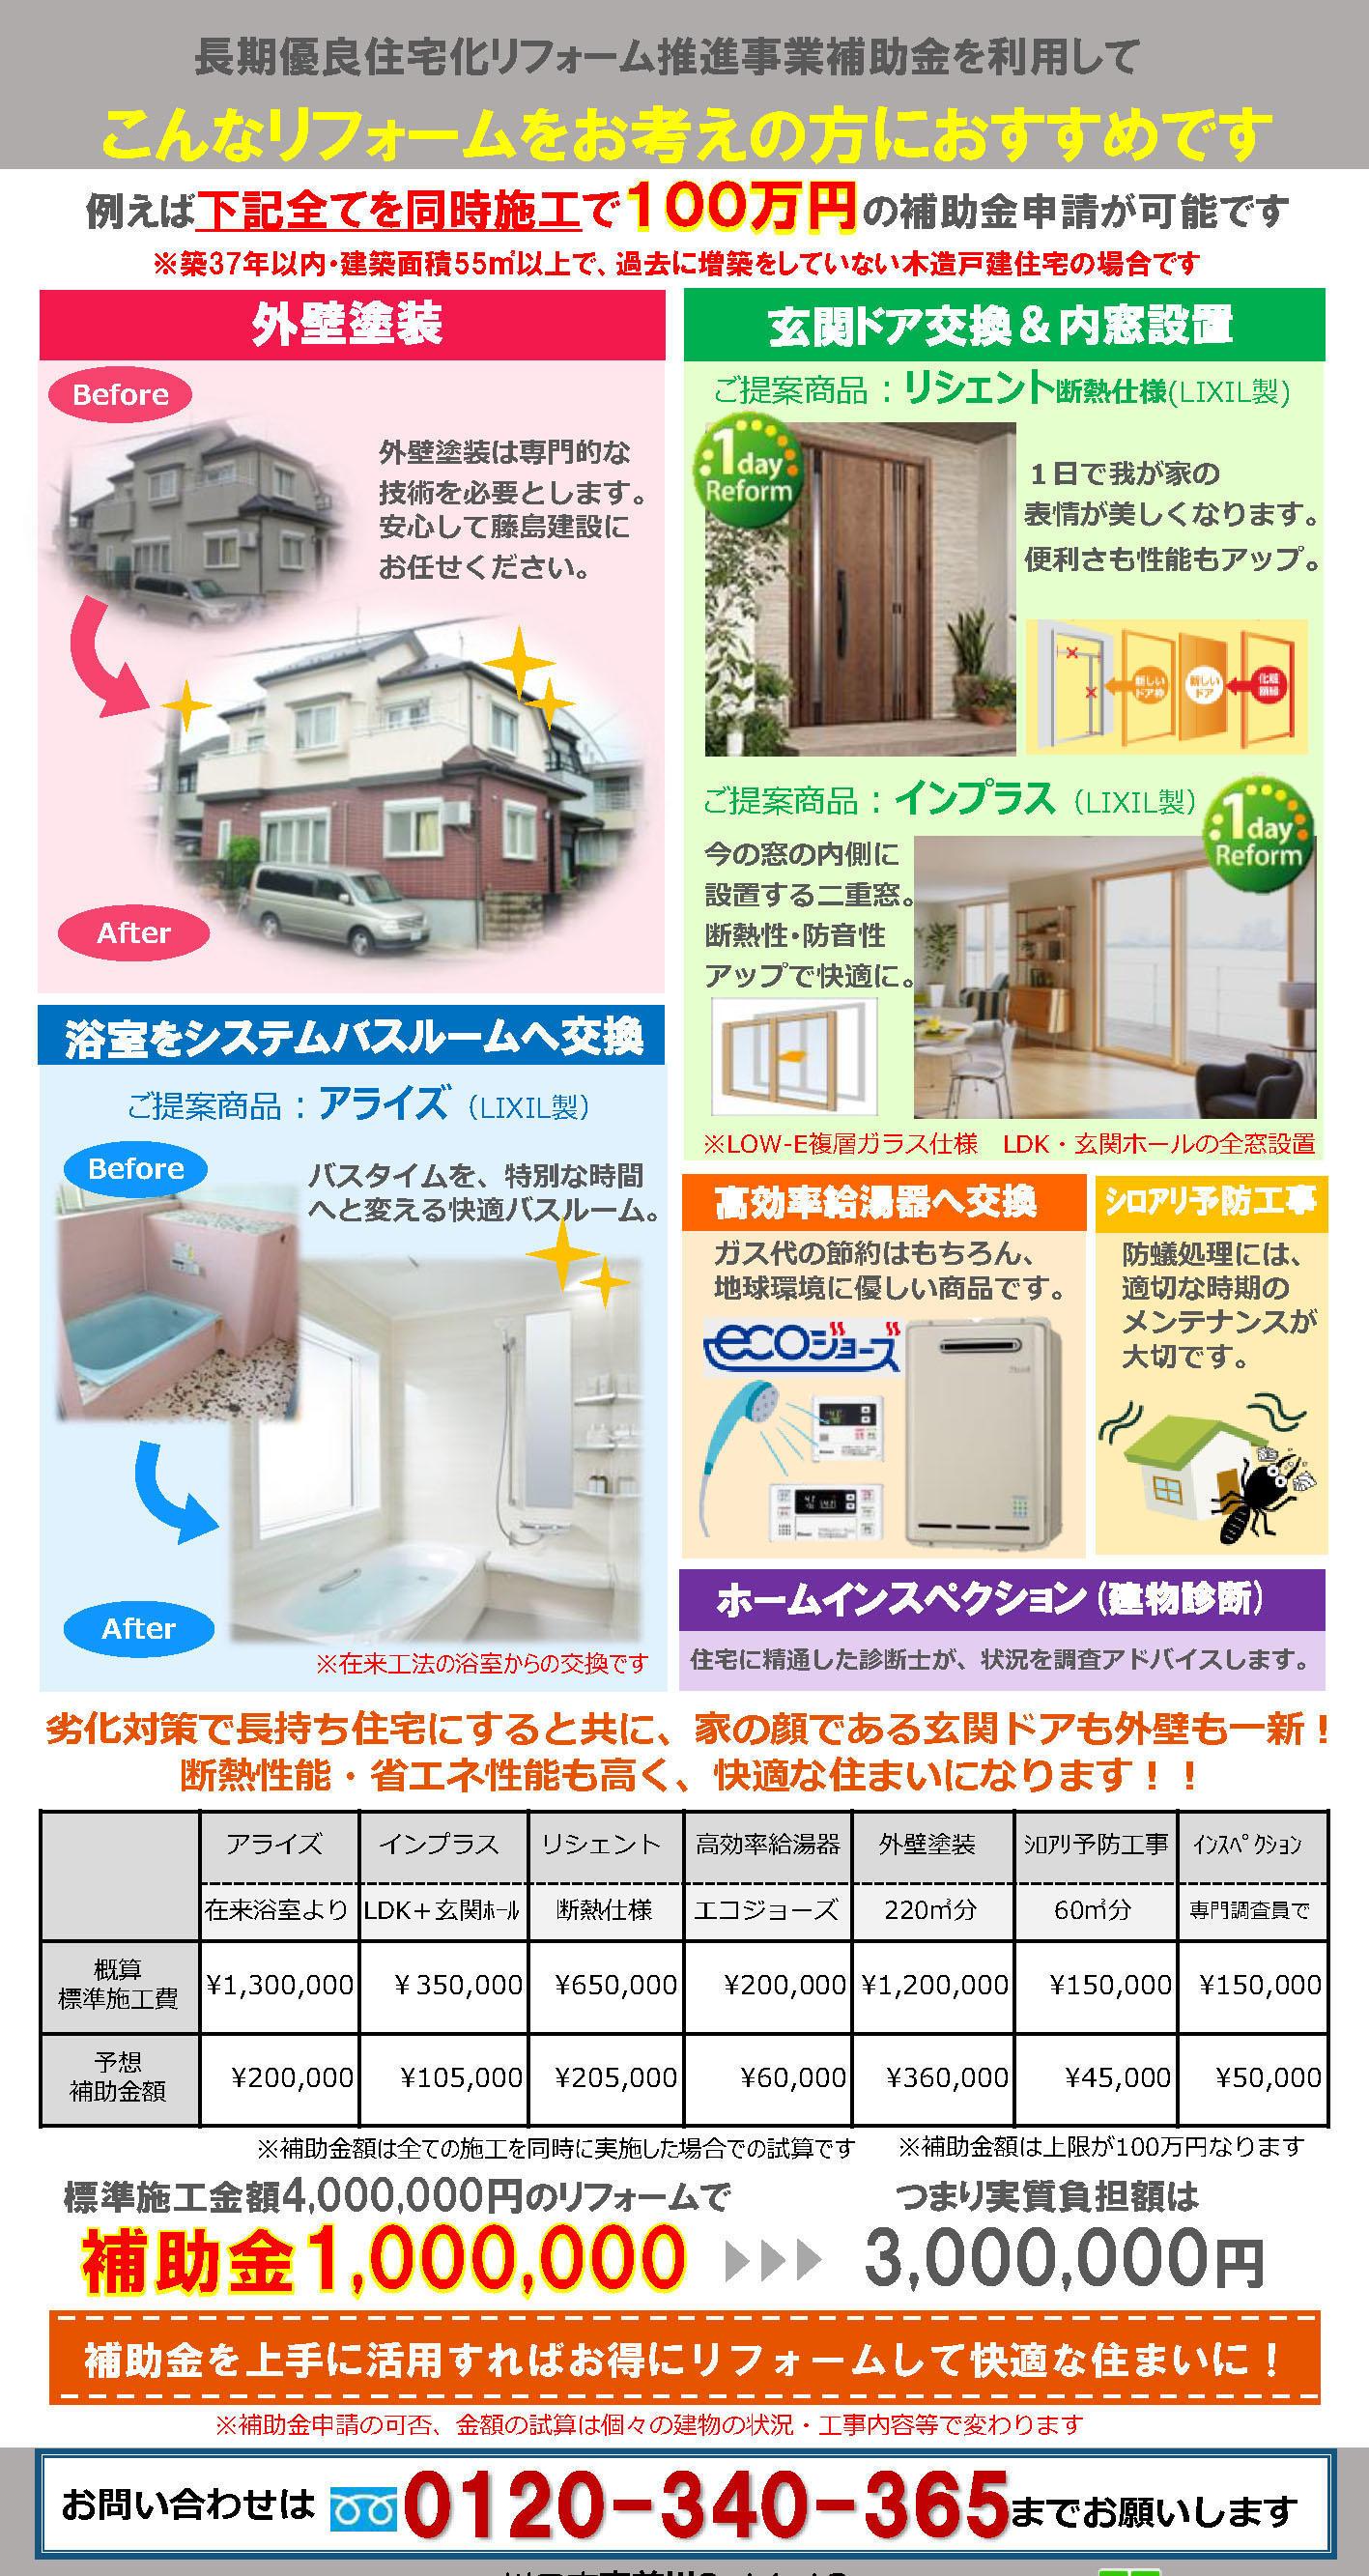 https://lixil-reformshop.jp/shop/SP00001001/photos/b041e4af3b610780b56a35e8fdbc78ed634597c7.jpg